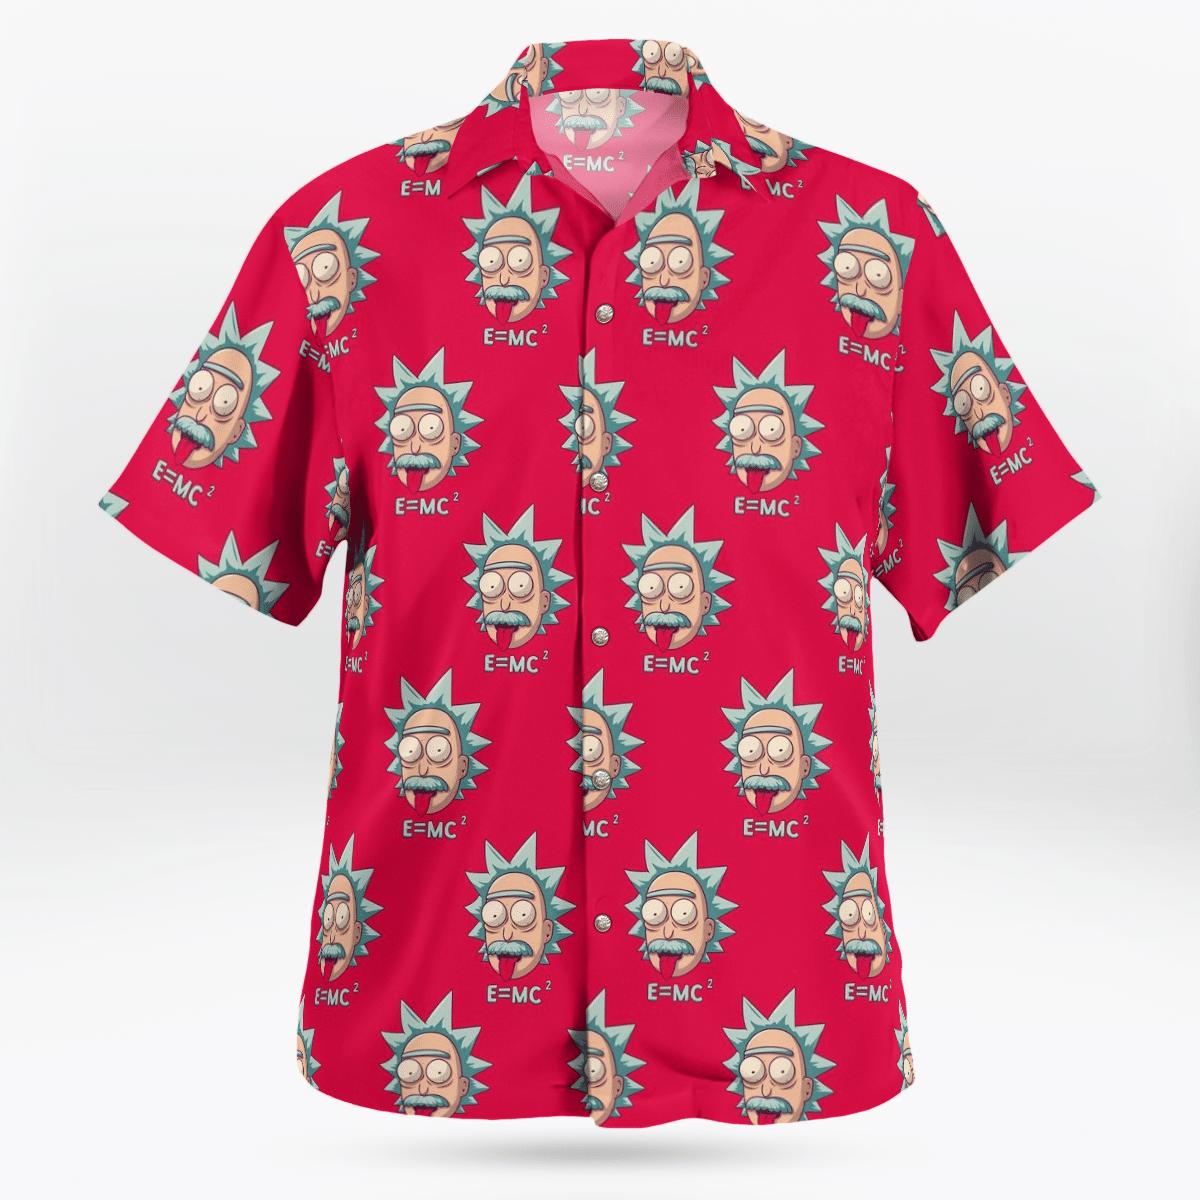 Einstein Emc2 Hawaiian shirt